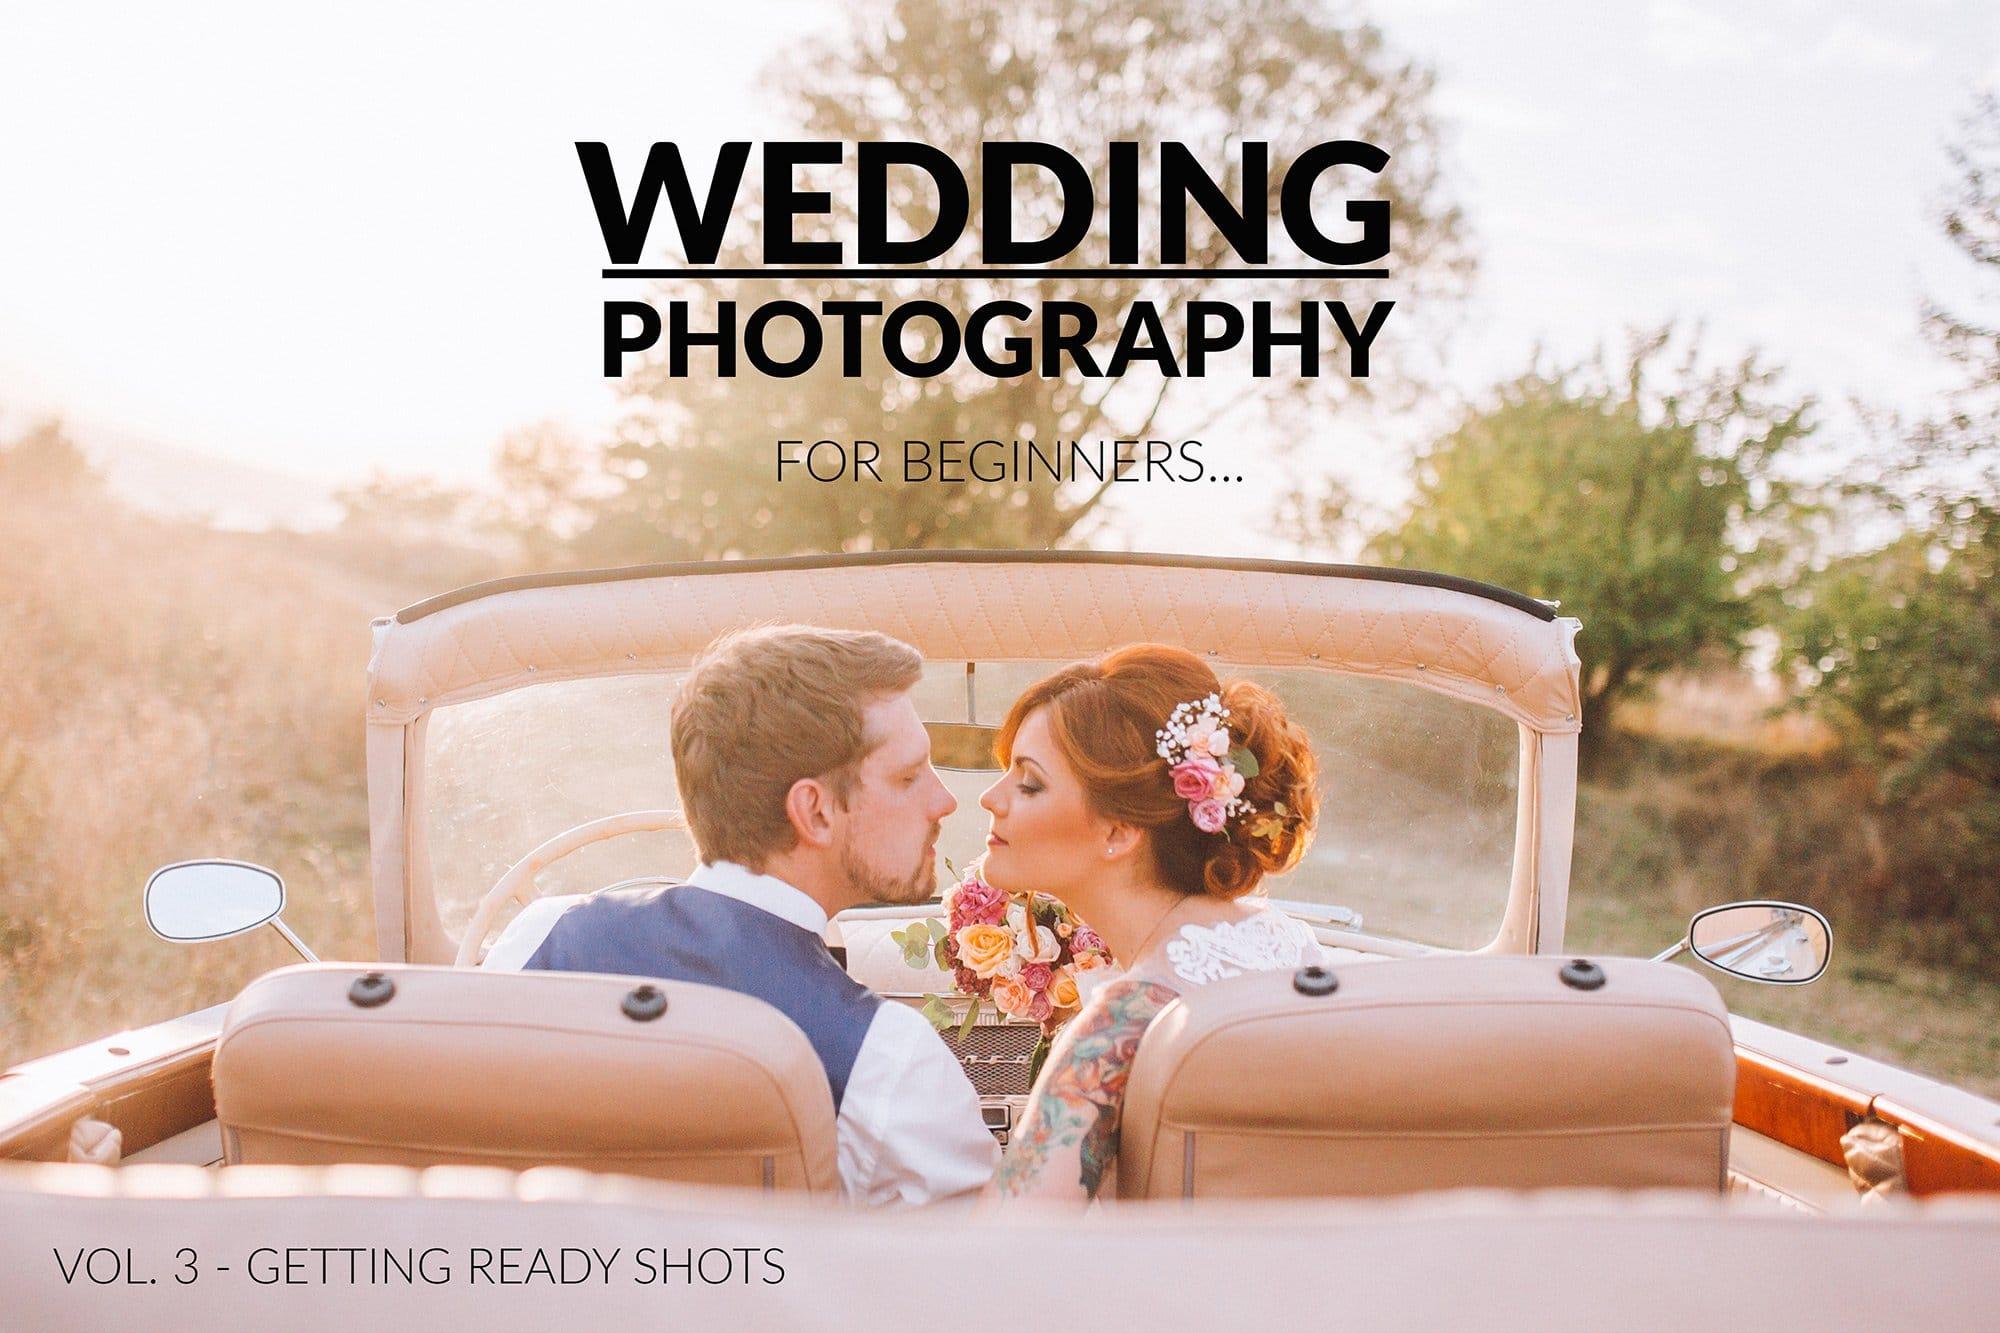 Wedding Photography Tips For Beginners: Wedding Photography For Beginners - Vol. 3